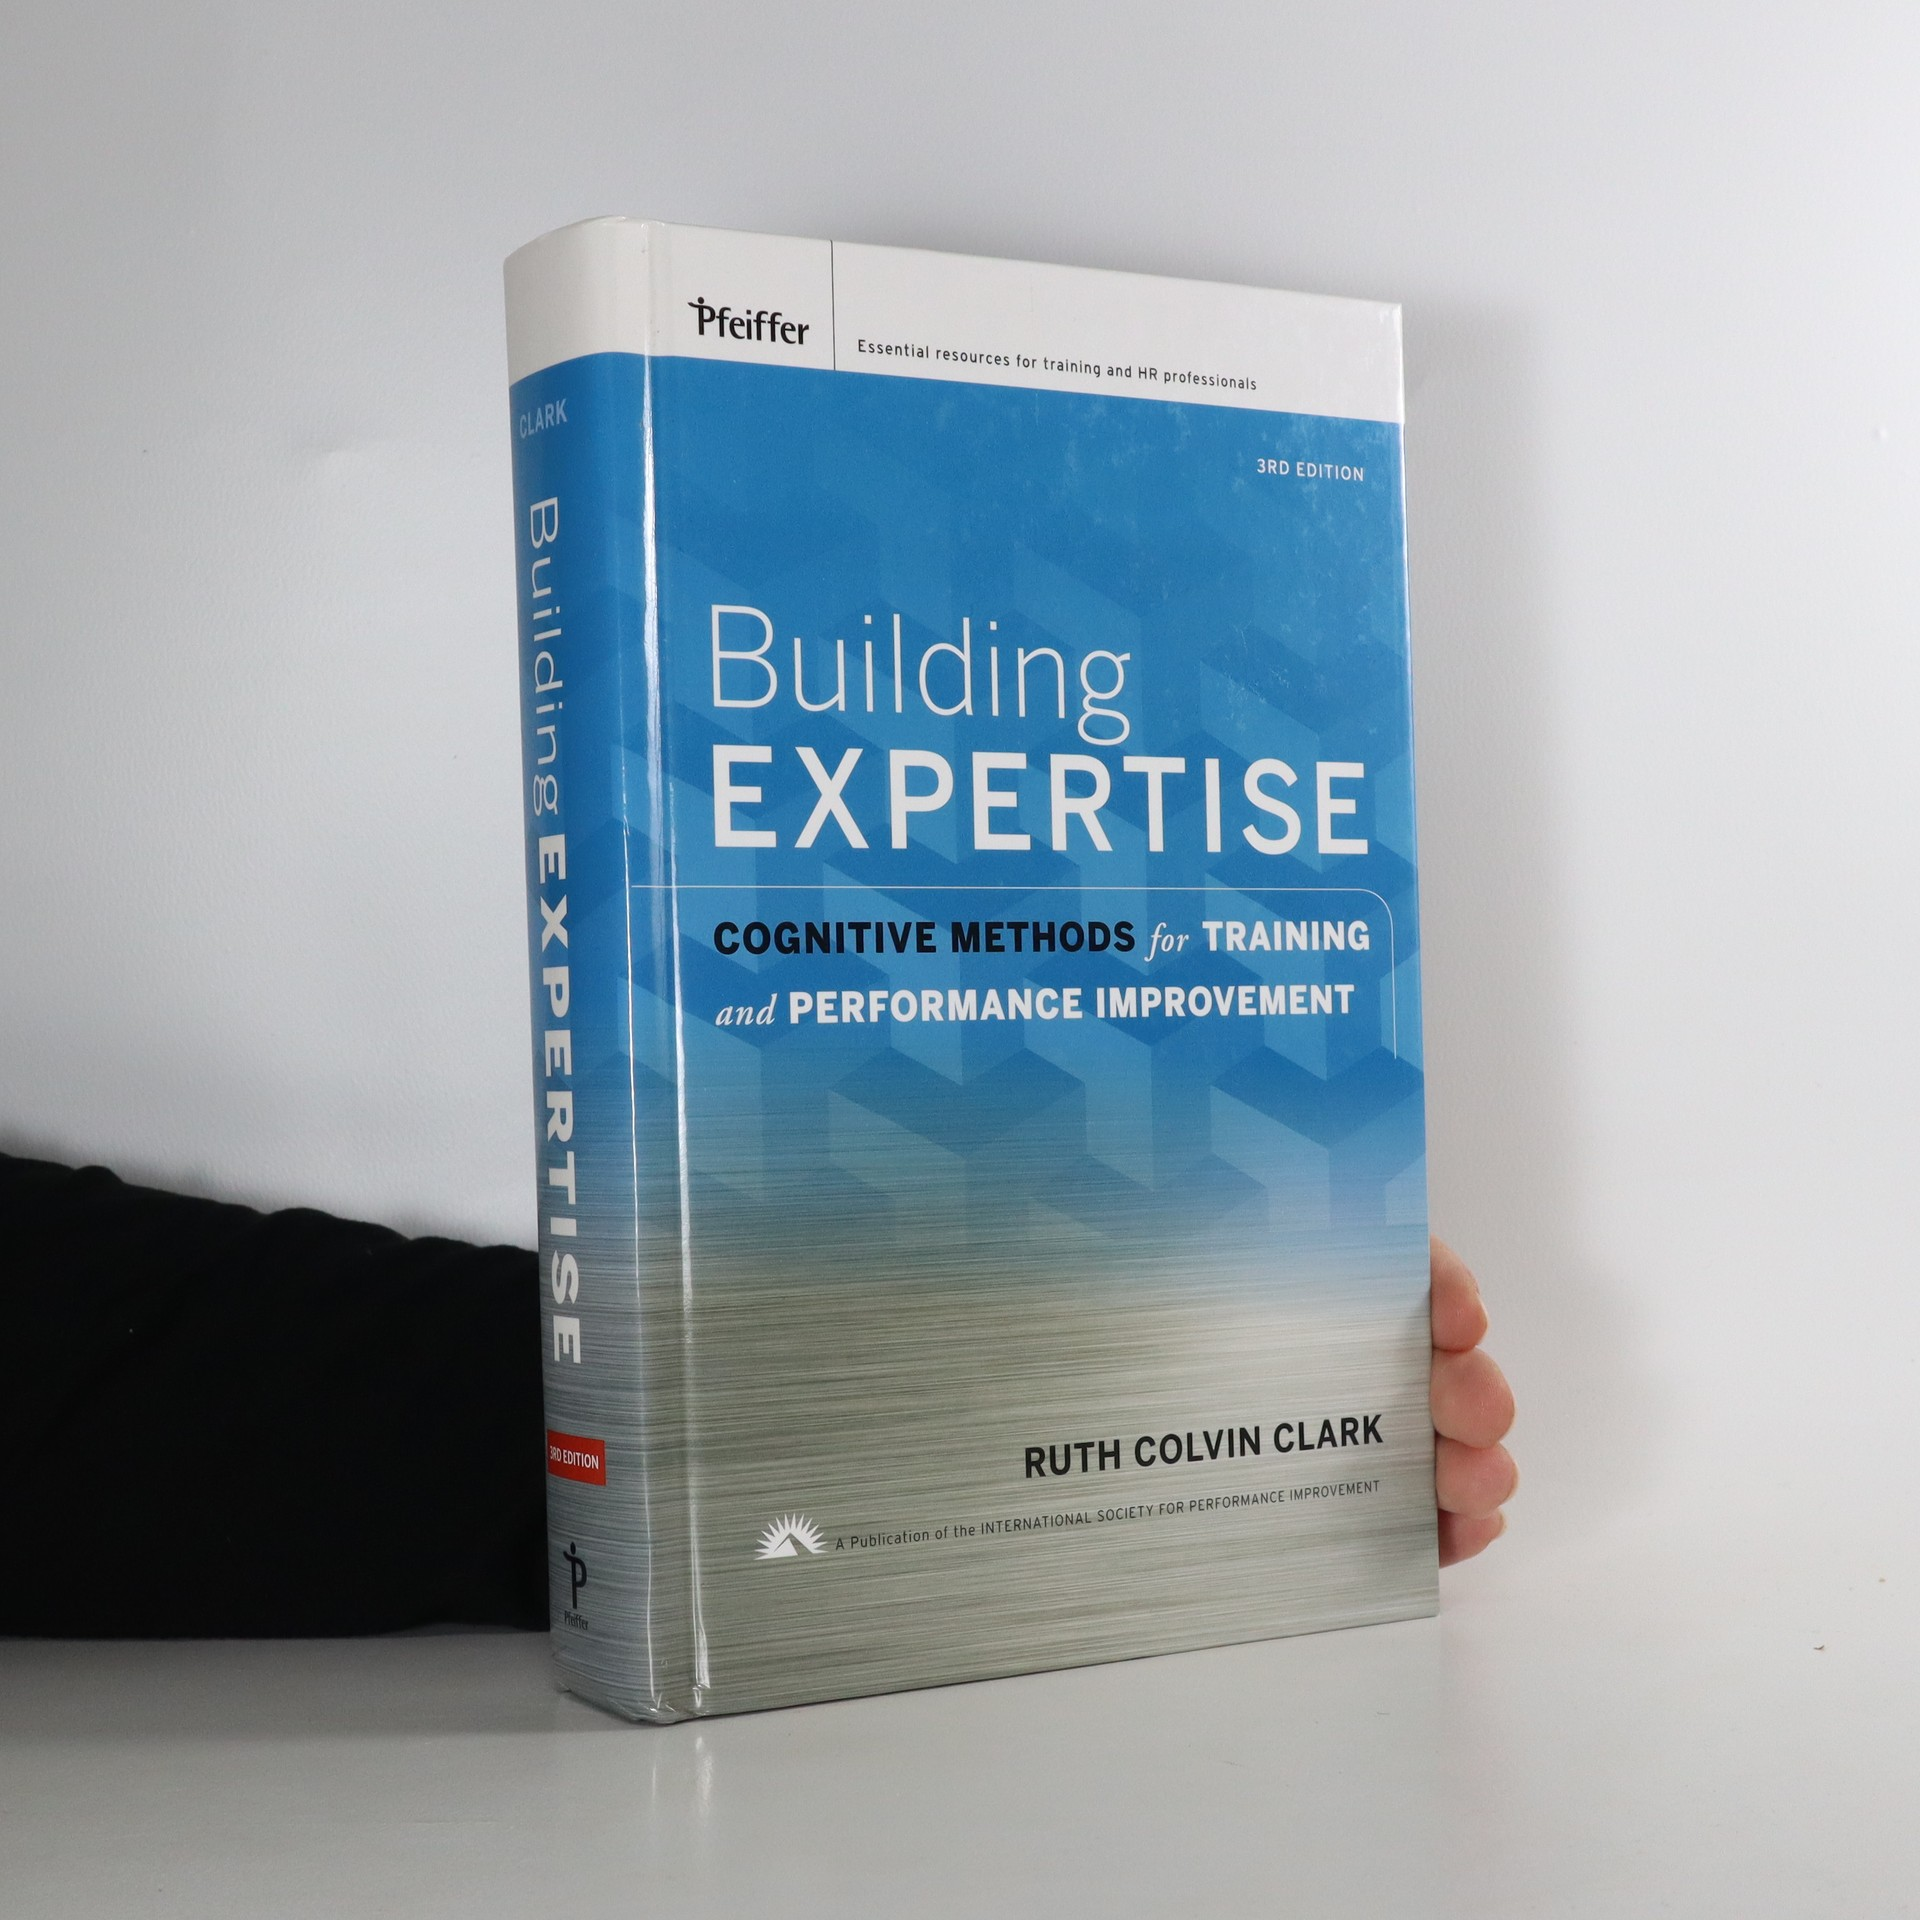 antikvární kniha Building expertise. Cognitive methods for training and performance improvement, neuveden